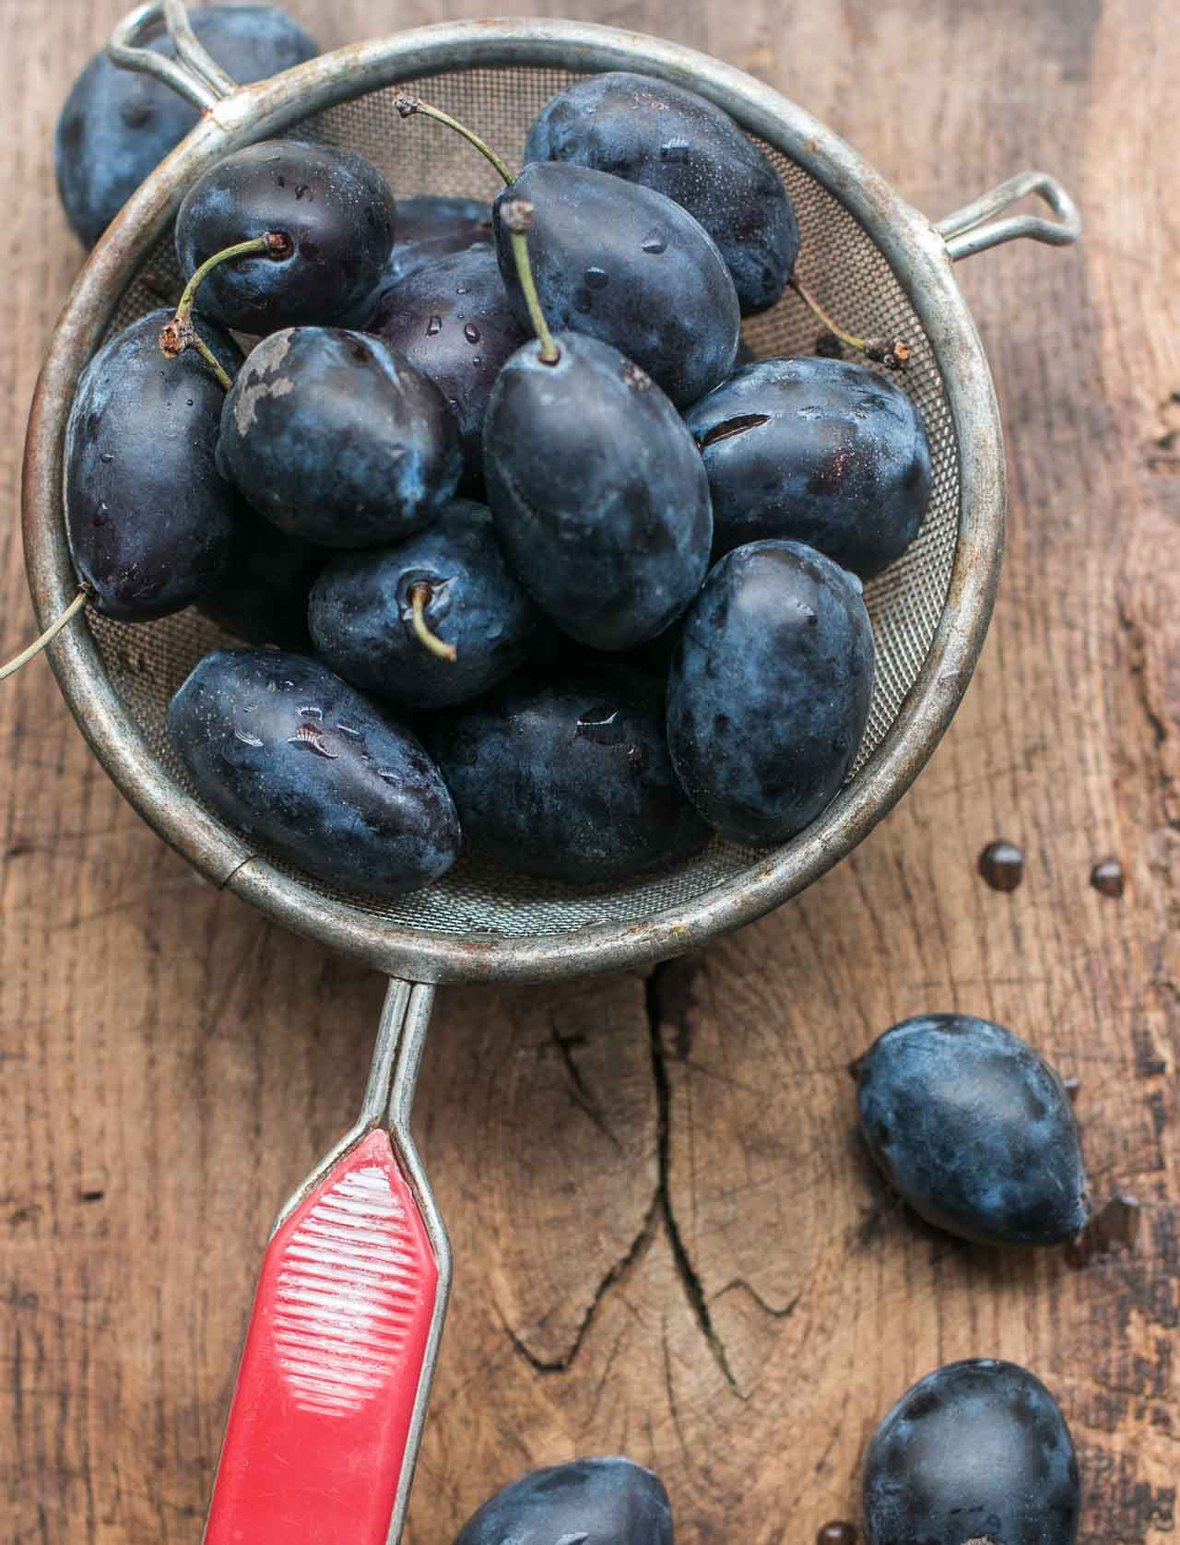 Italian prune plums Damsons